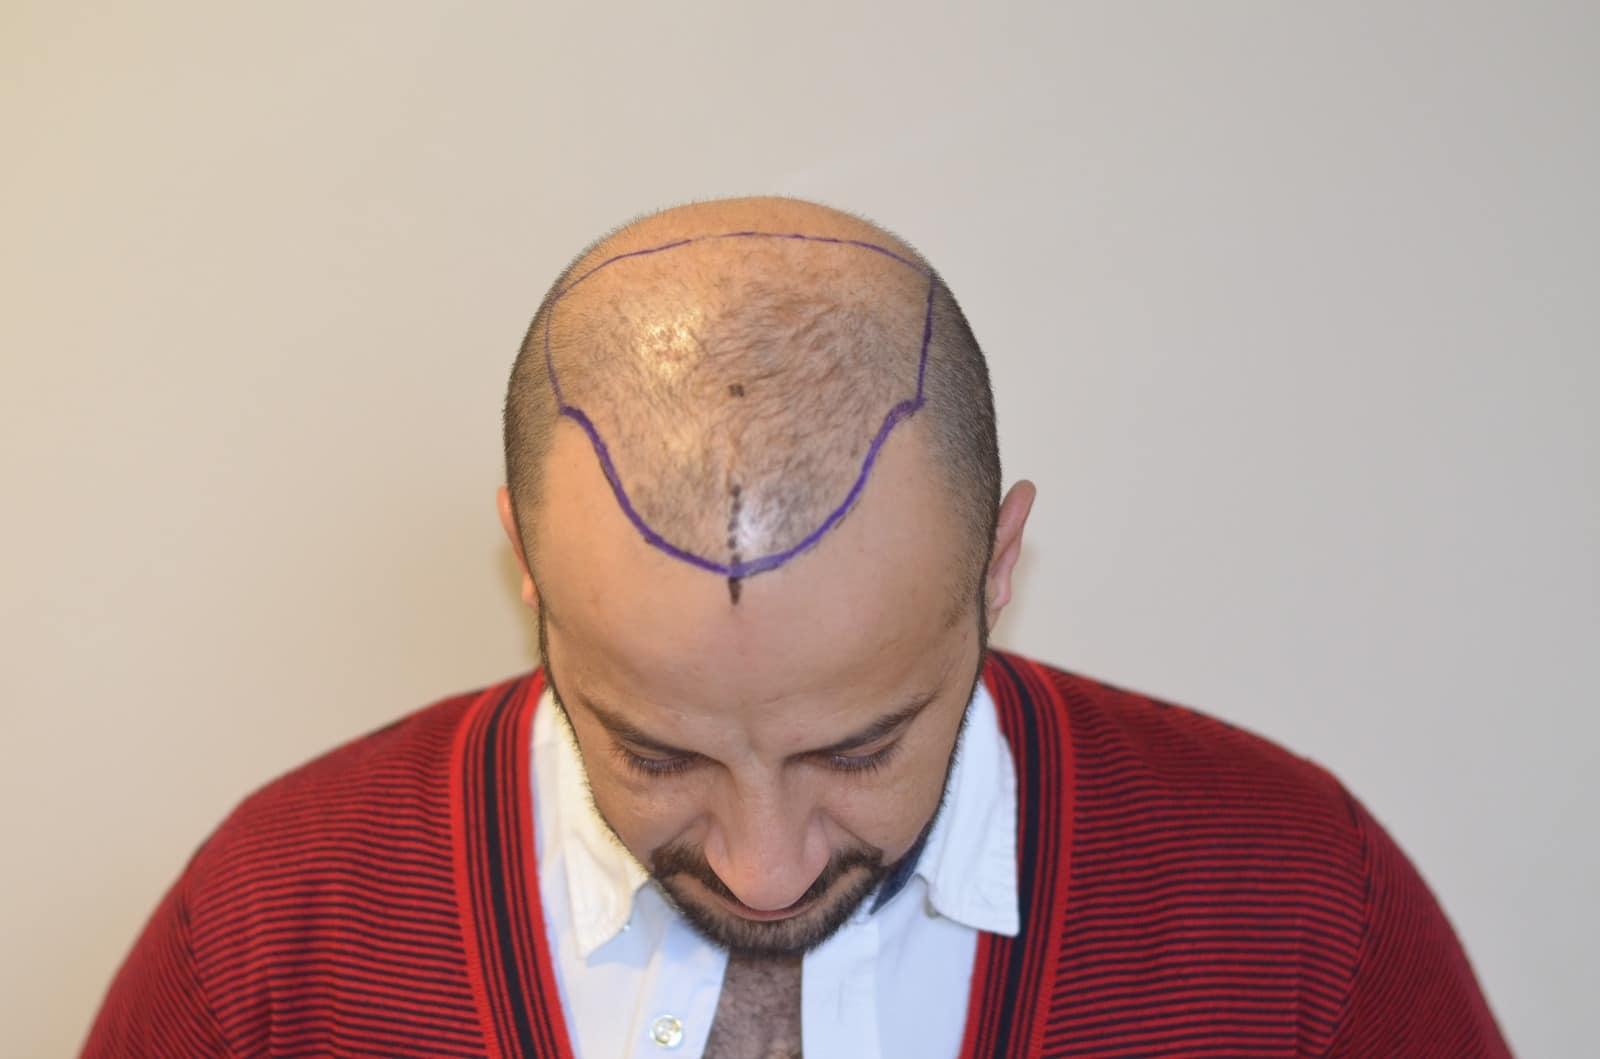 haar-transplantation-in-der-türkei-istanbul (14)